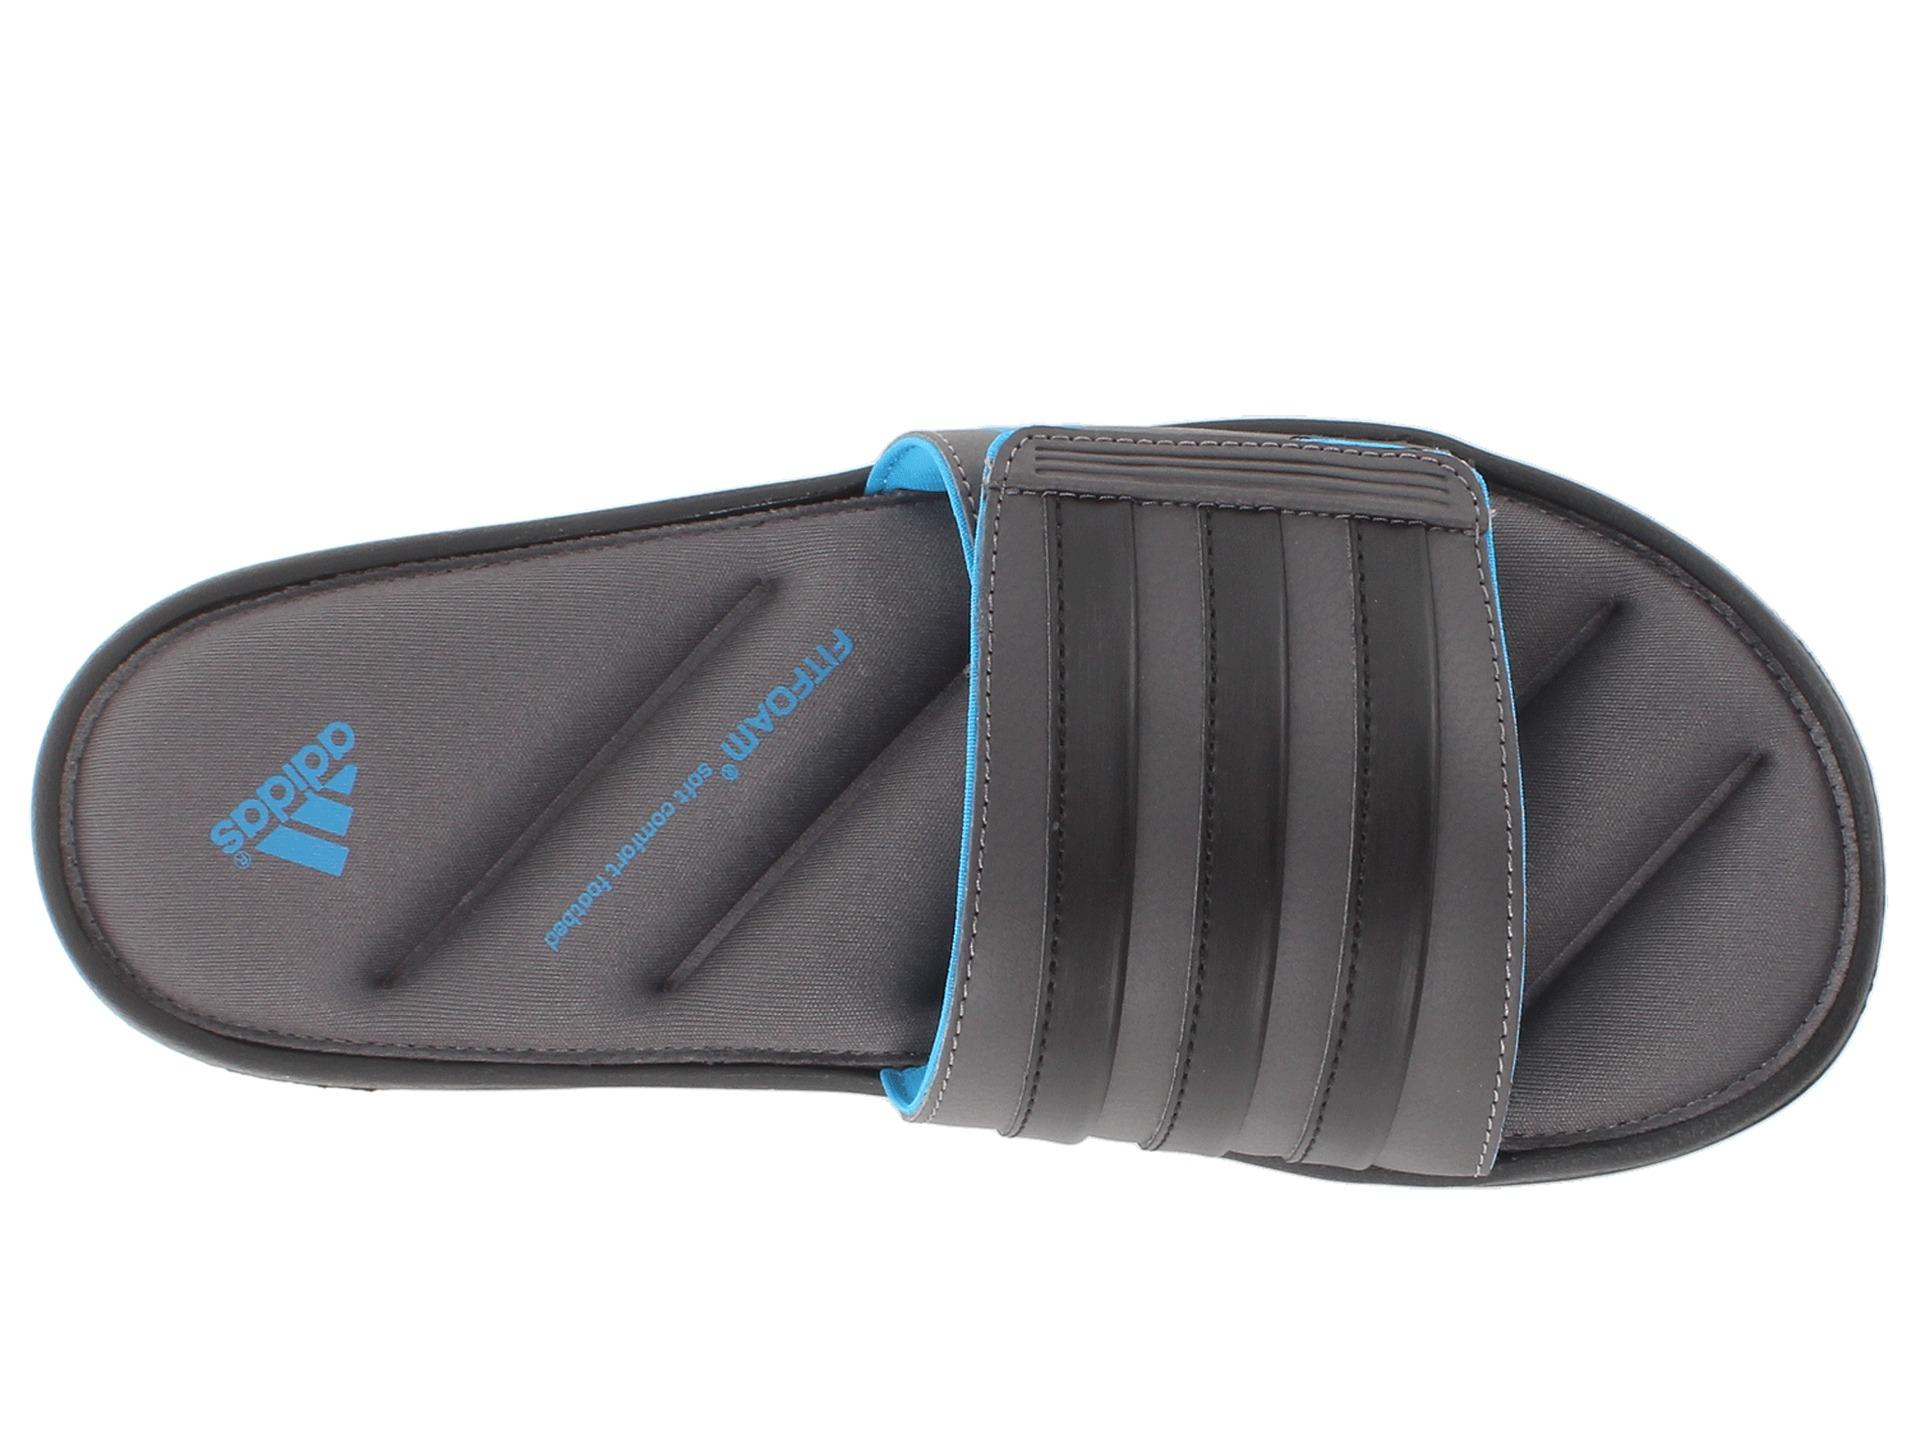 d7b27b6ffc7b91 Lyst adidas originals zeitfrei fitfoam slide in gray for men memory foam  adidas flip jpg 1920x1440